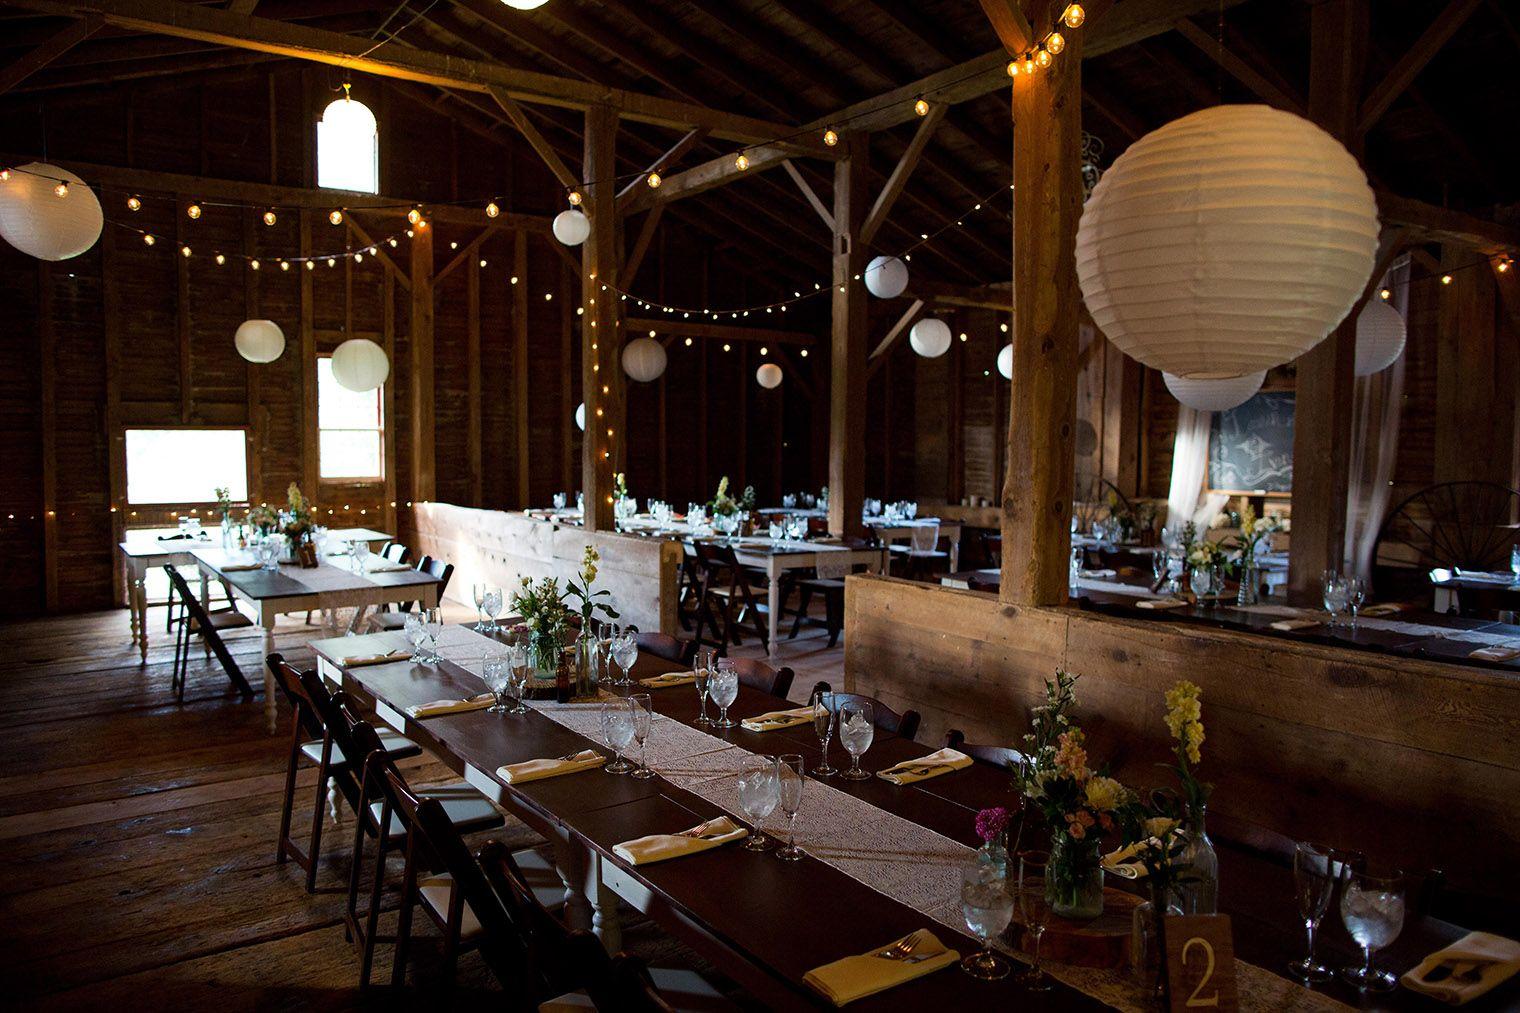 46+ Wedding venues upstate ny barn ideas in 2021